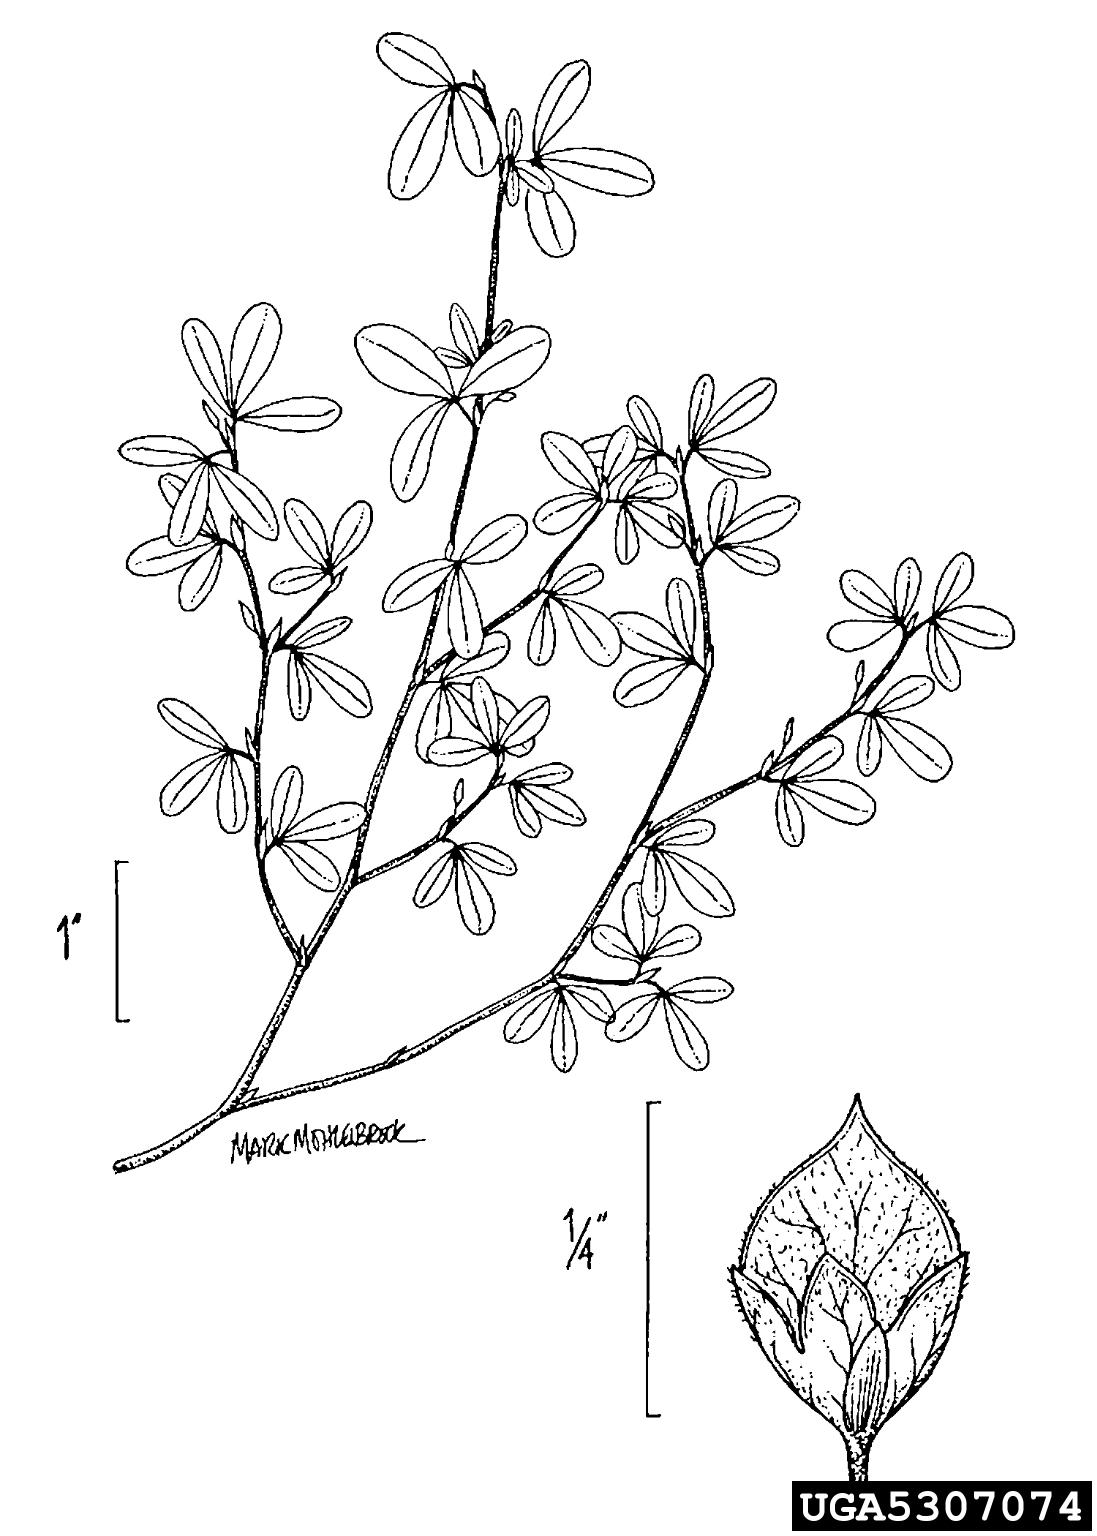 Japanese clover, Kummerowia striata (Fabales: Fabaceae